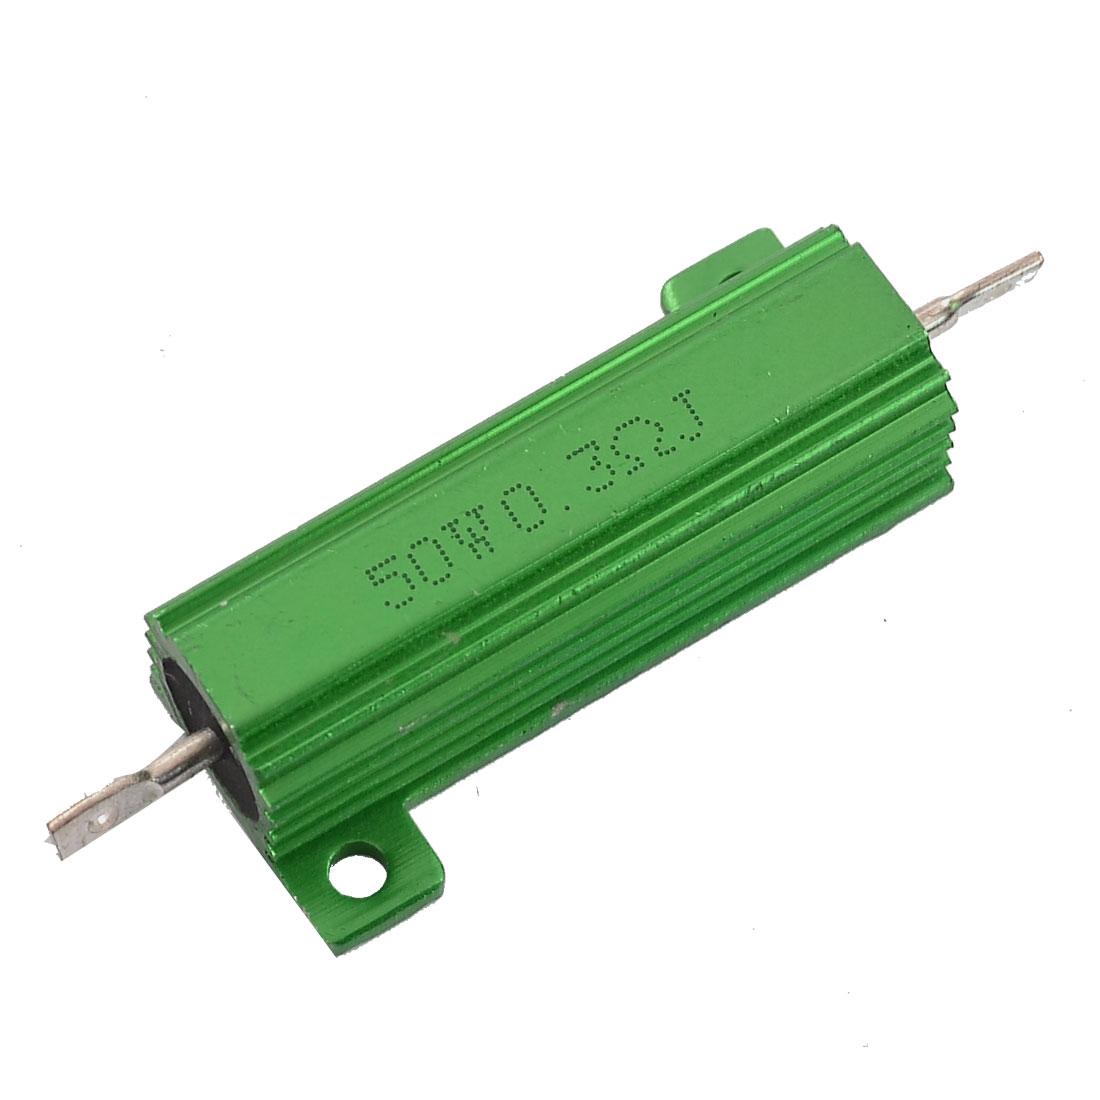 Aluminum Housing 50W Watt 0.3 Ohm 5% Wirewound Resistor for Transducer